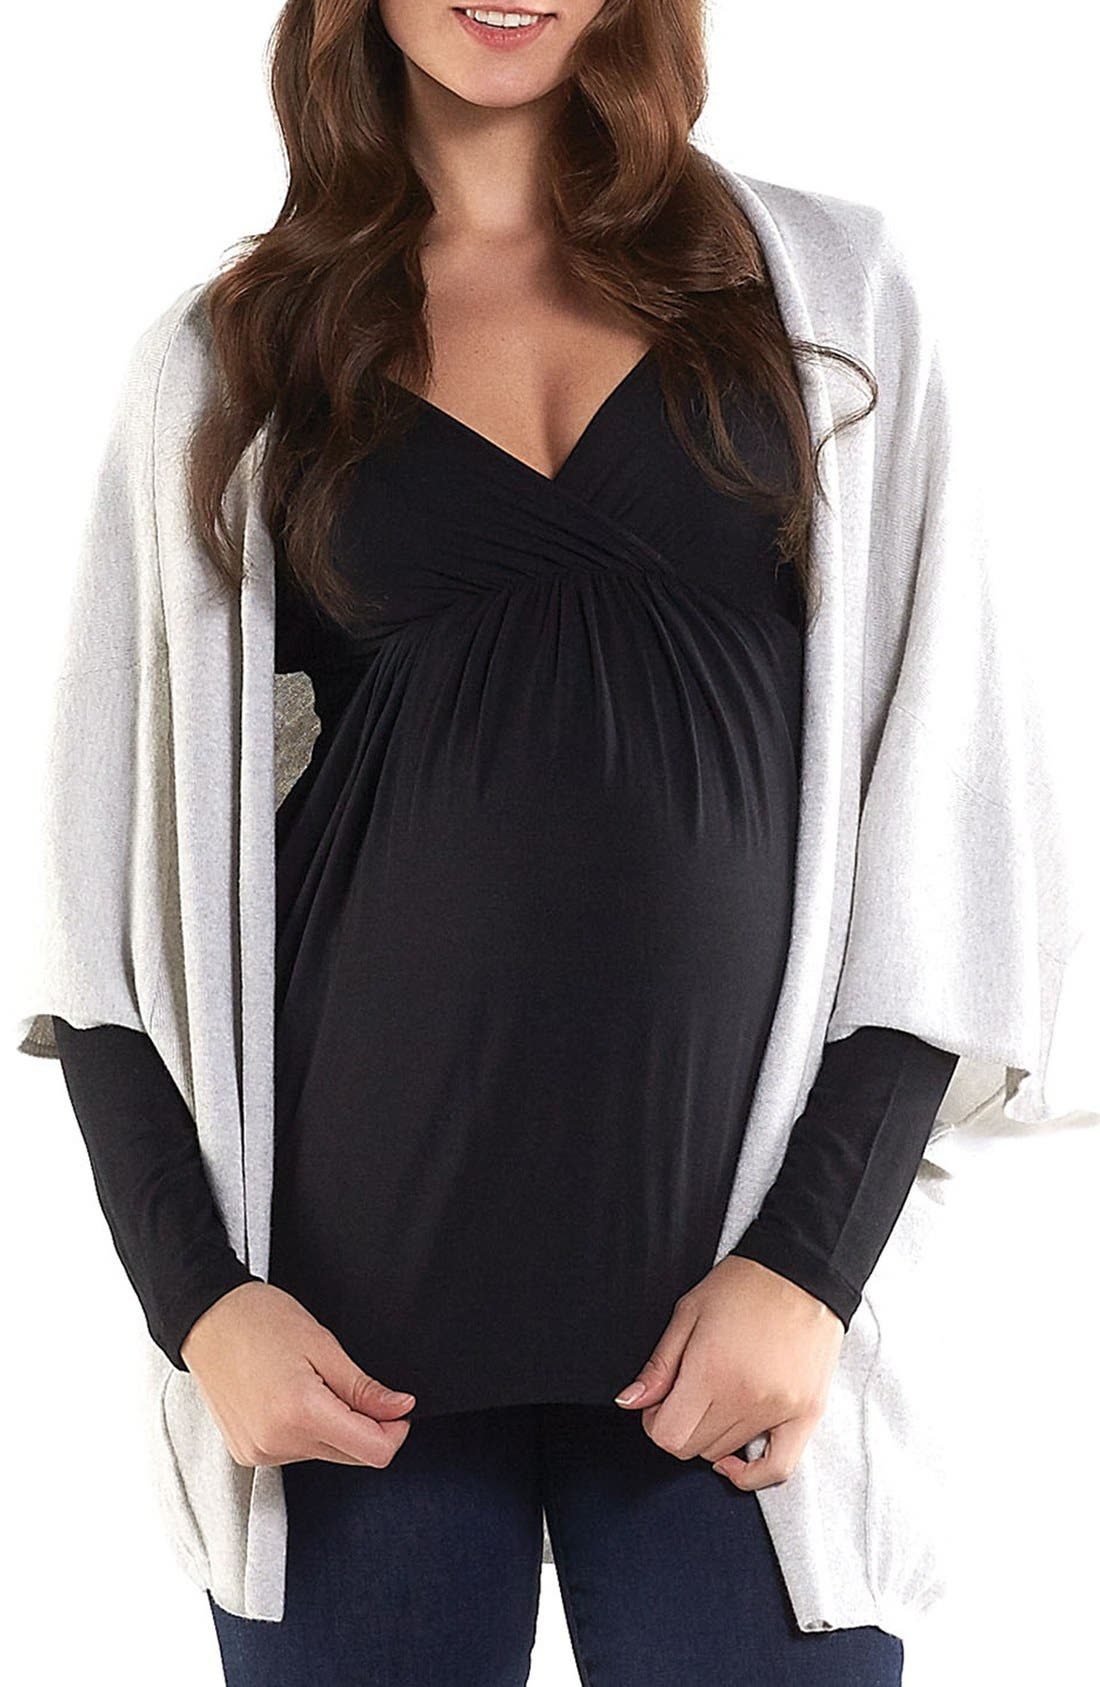 Tart Maternity 'Harlyn' Cotton & Cashmere Maternity Wrap Cardigan